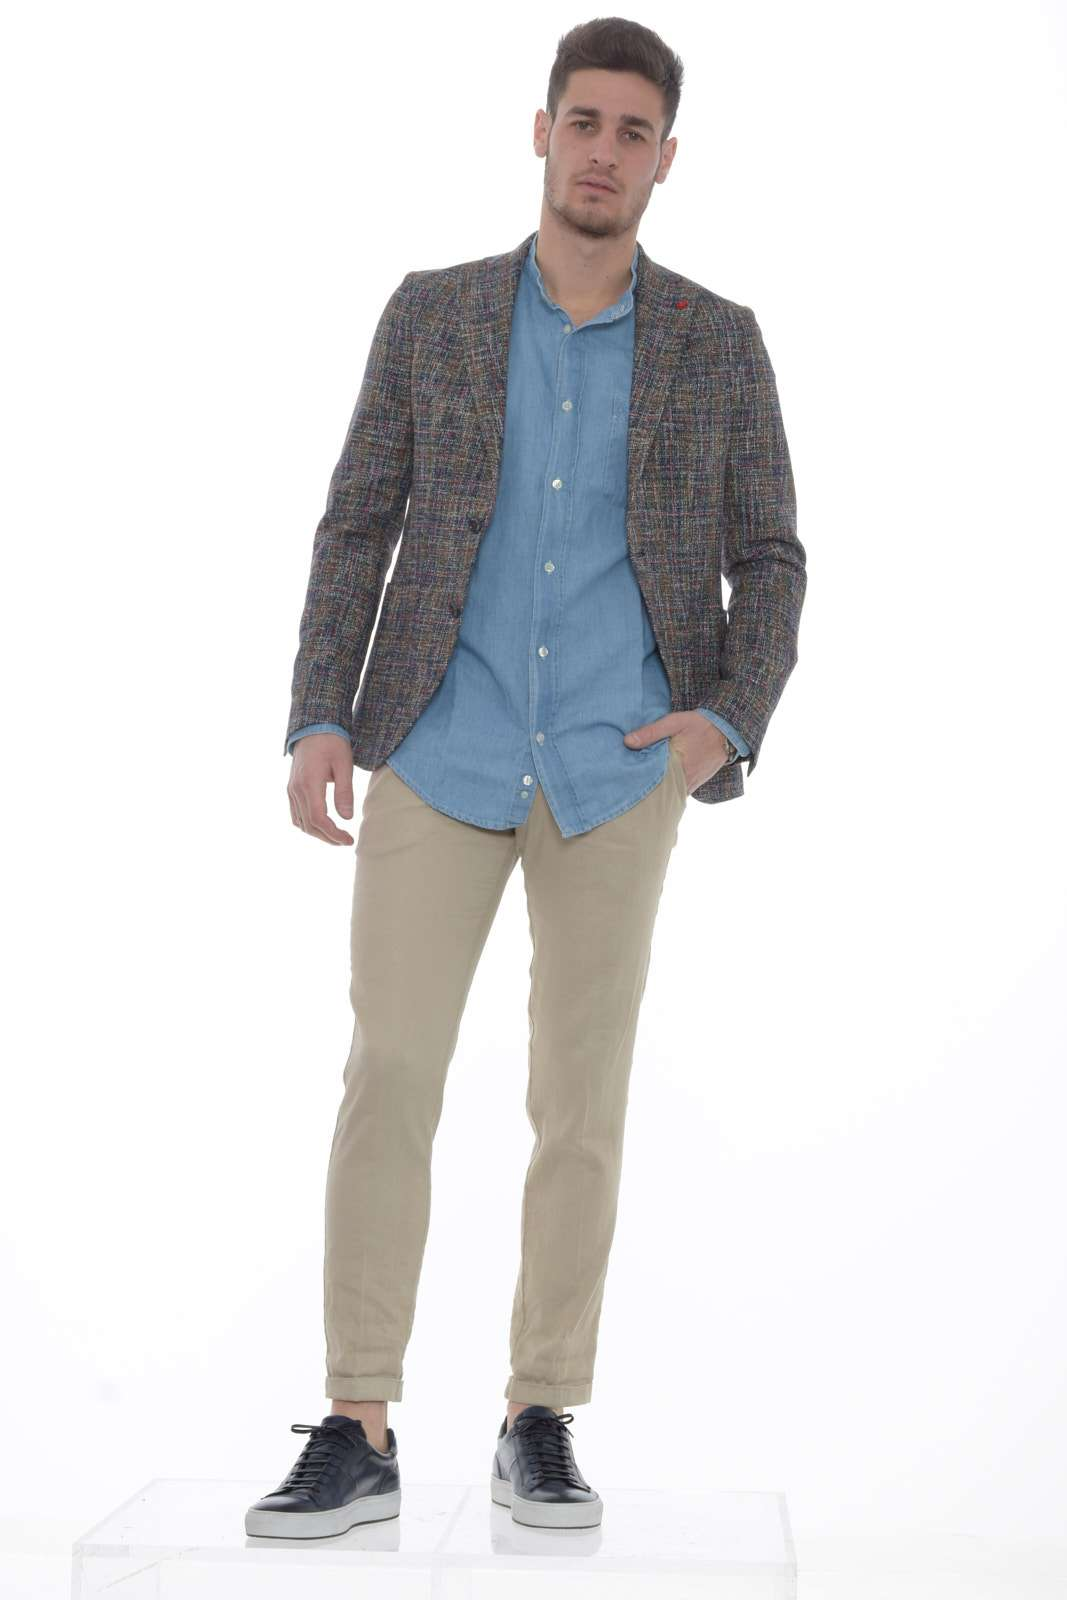 https://www.parmax.com/media/catalog/product/a/i/PE-outlet_parmax-giacca-uomo-Manuel-Ritz-2632G2038%20193165-D_1.jpg